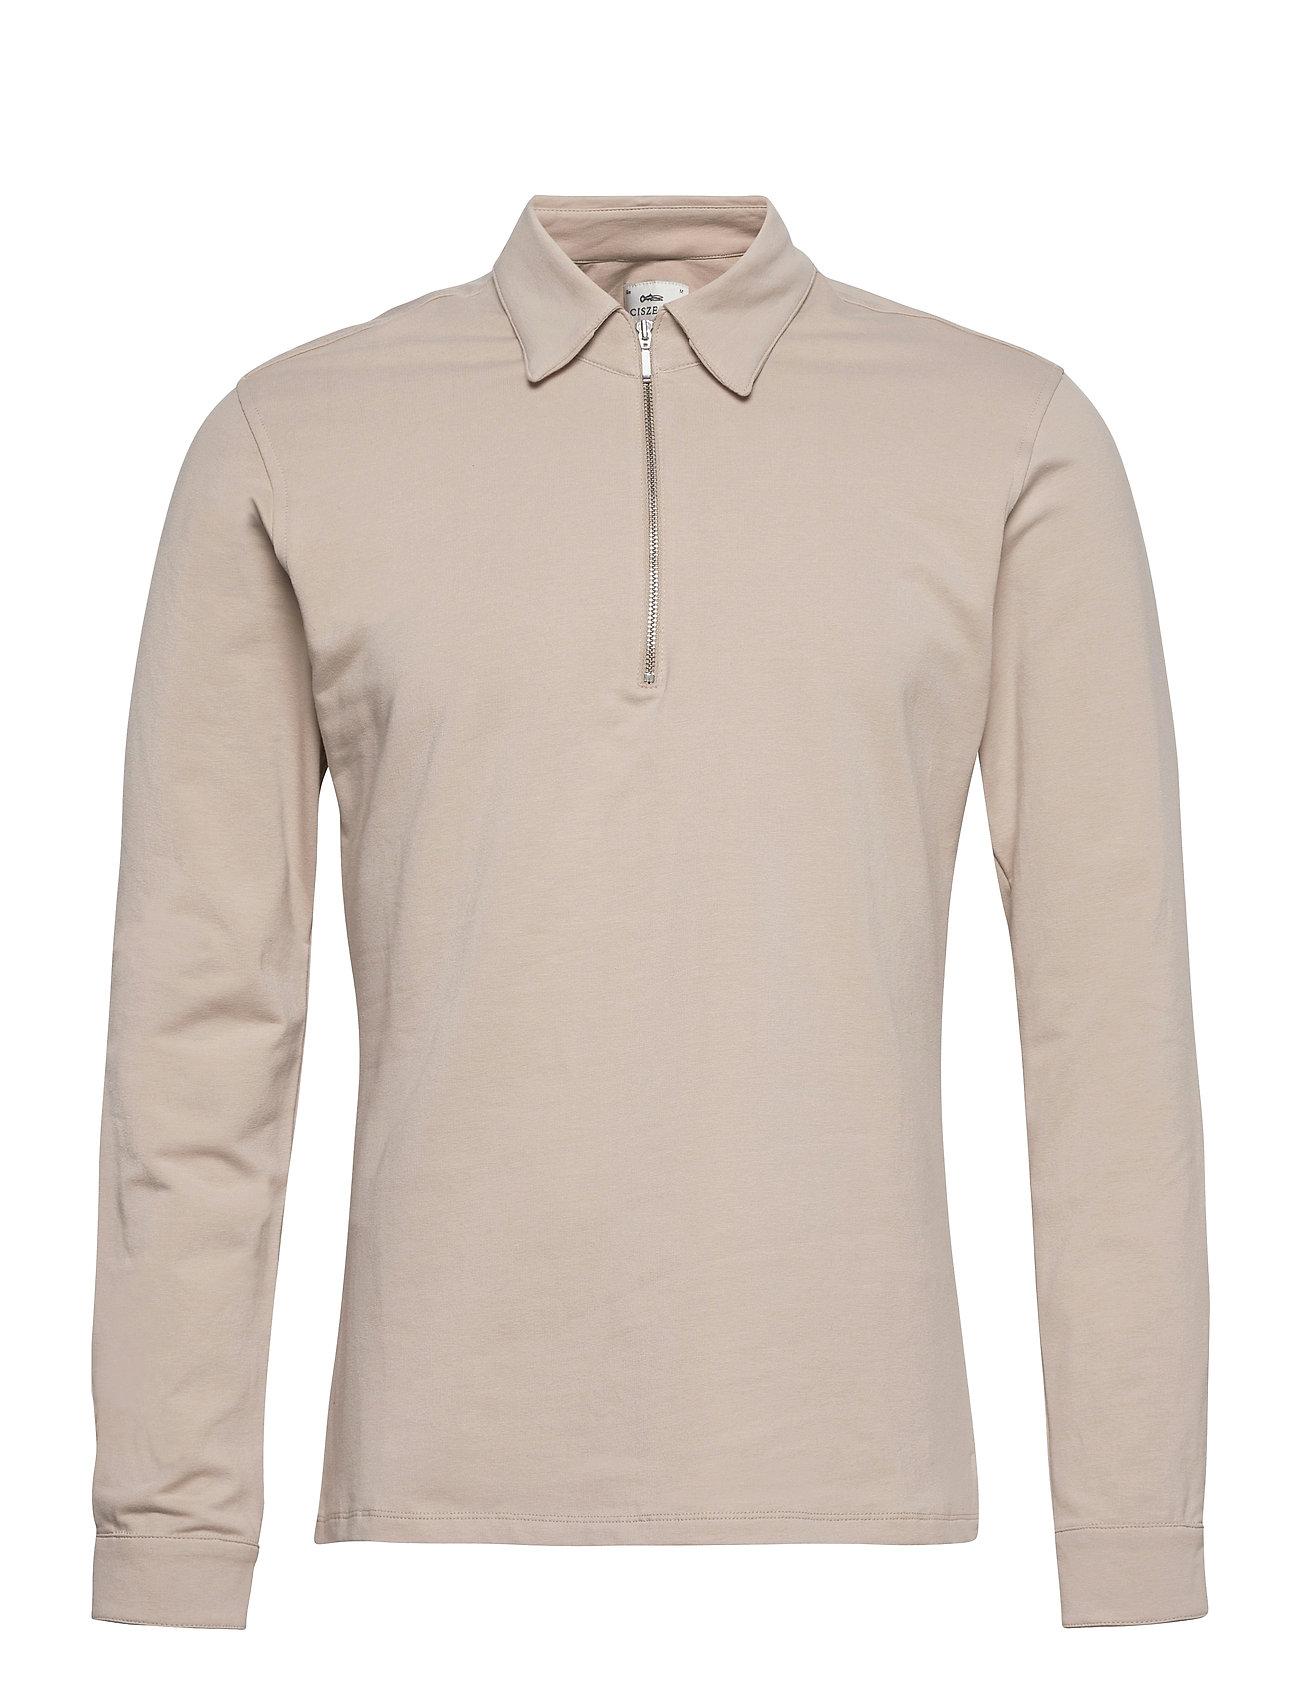 Image of Dev Half Zip Shirt Skjorte Casual Beige Ciszere (3488472299)